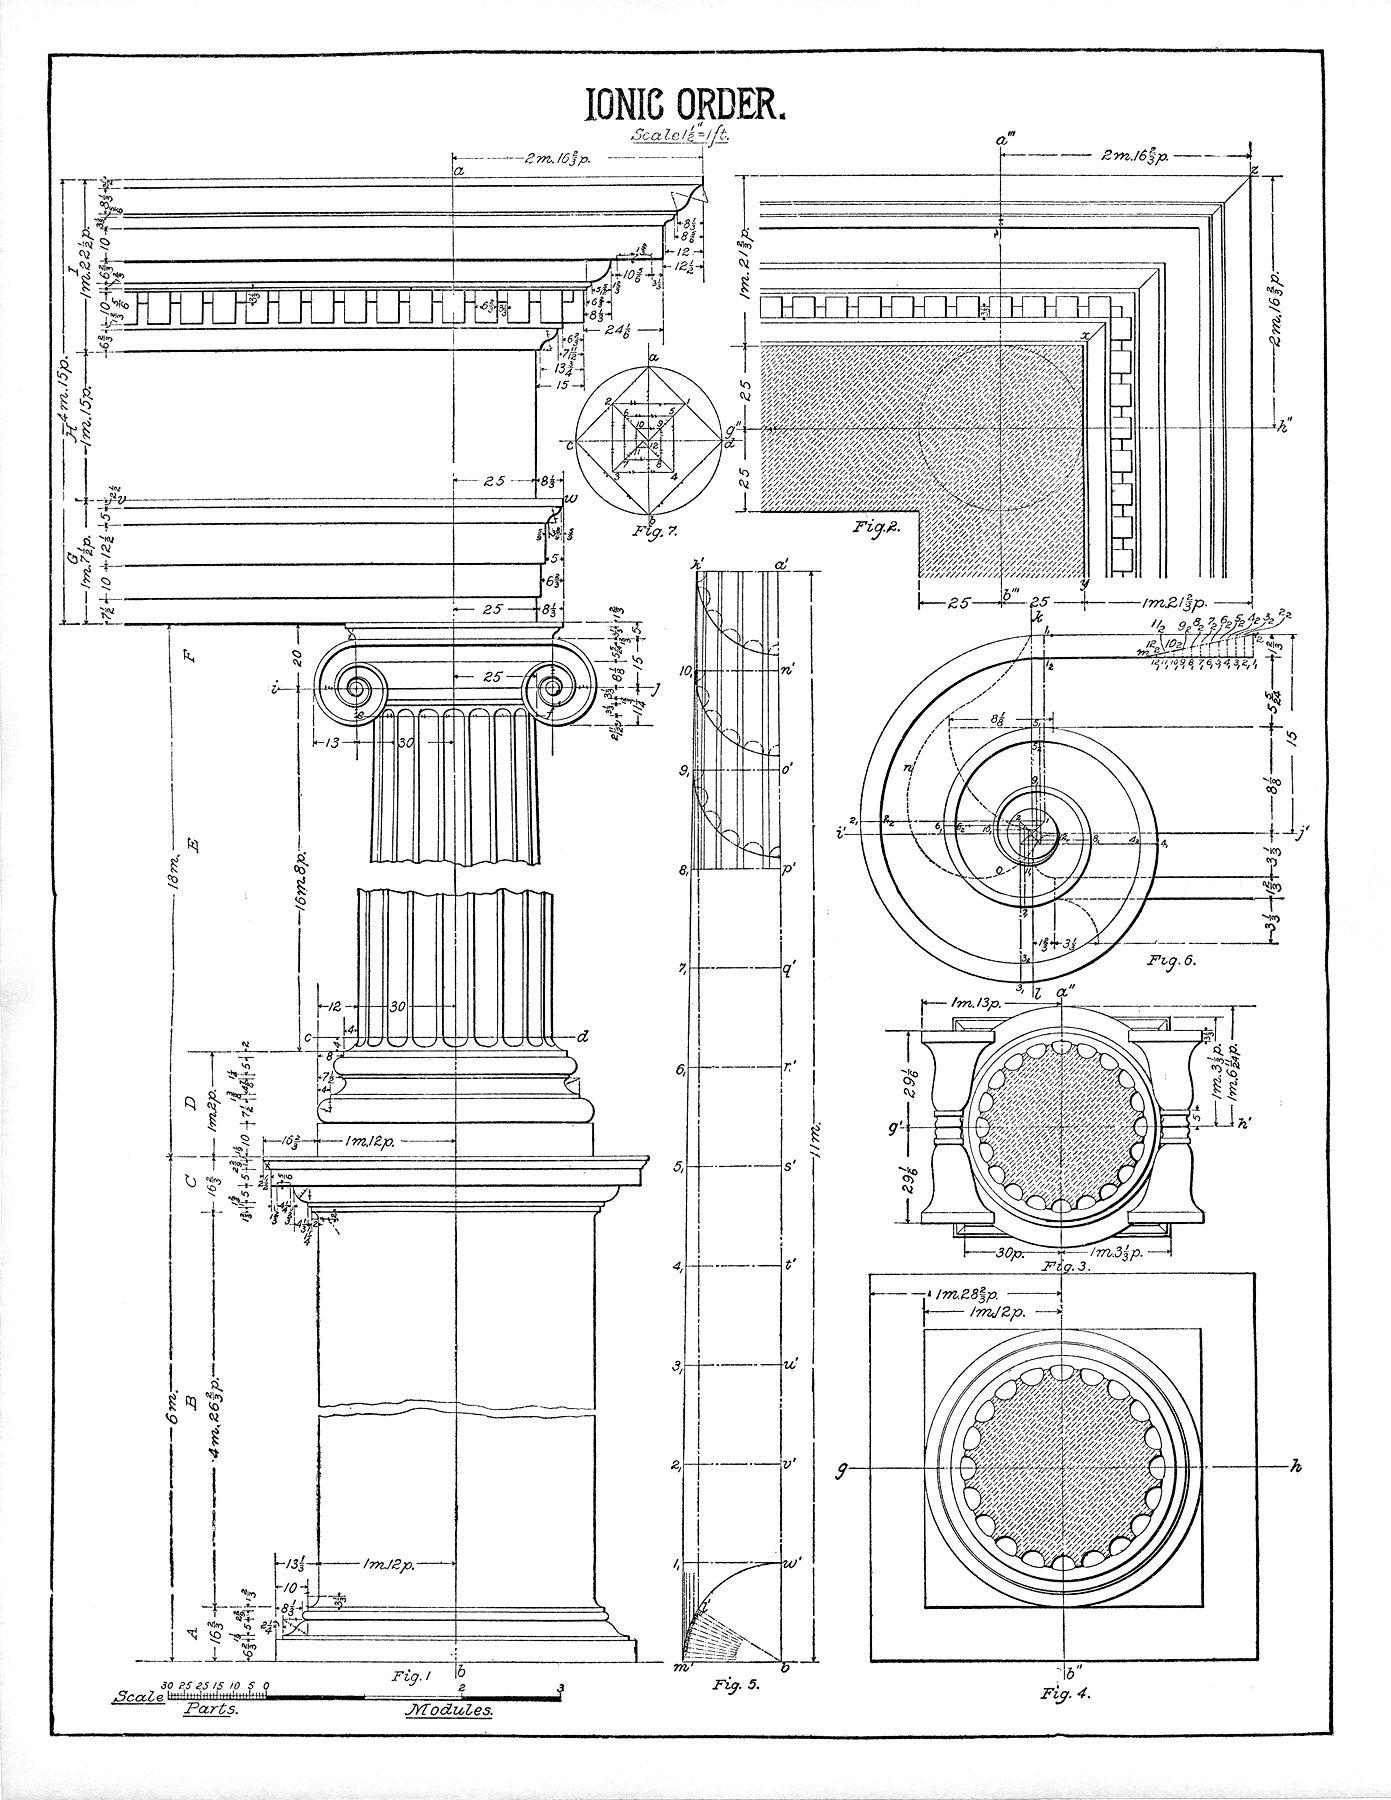 Architecture Printable Ionic